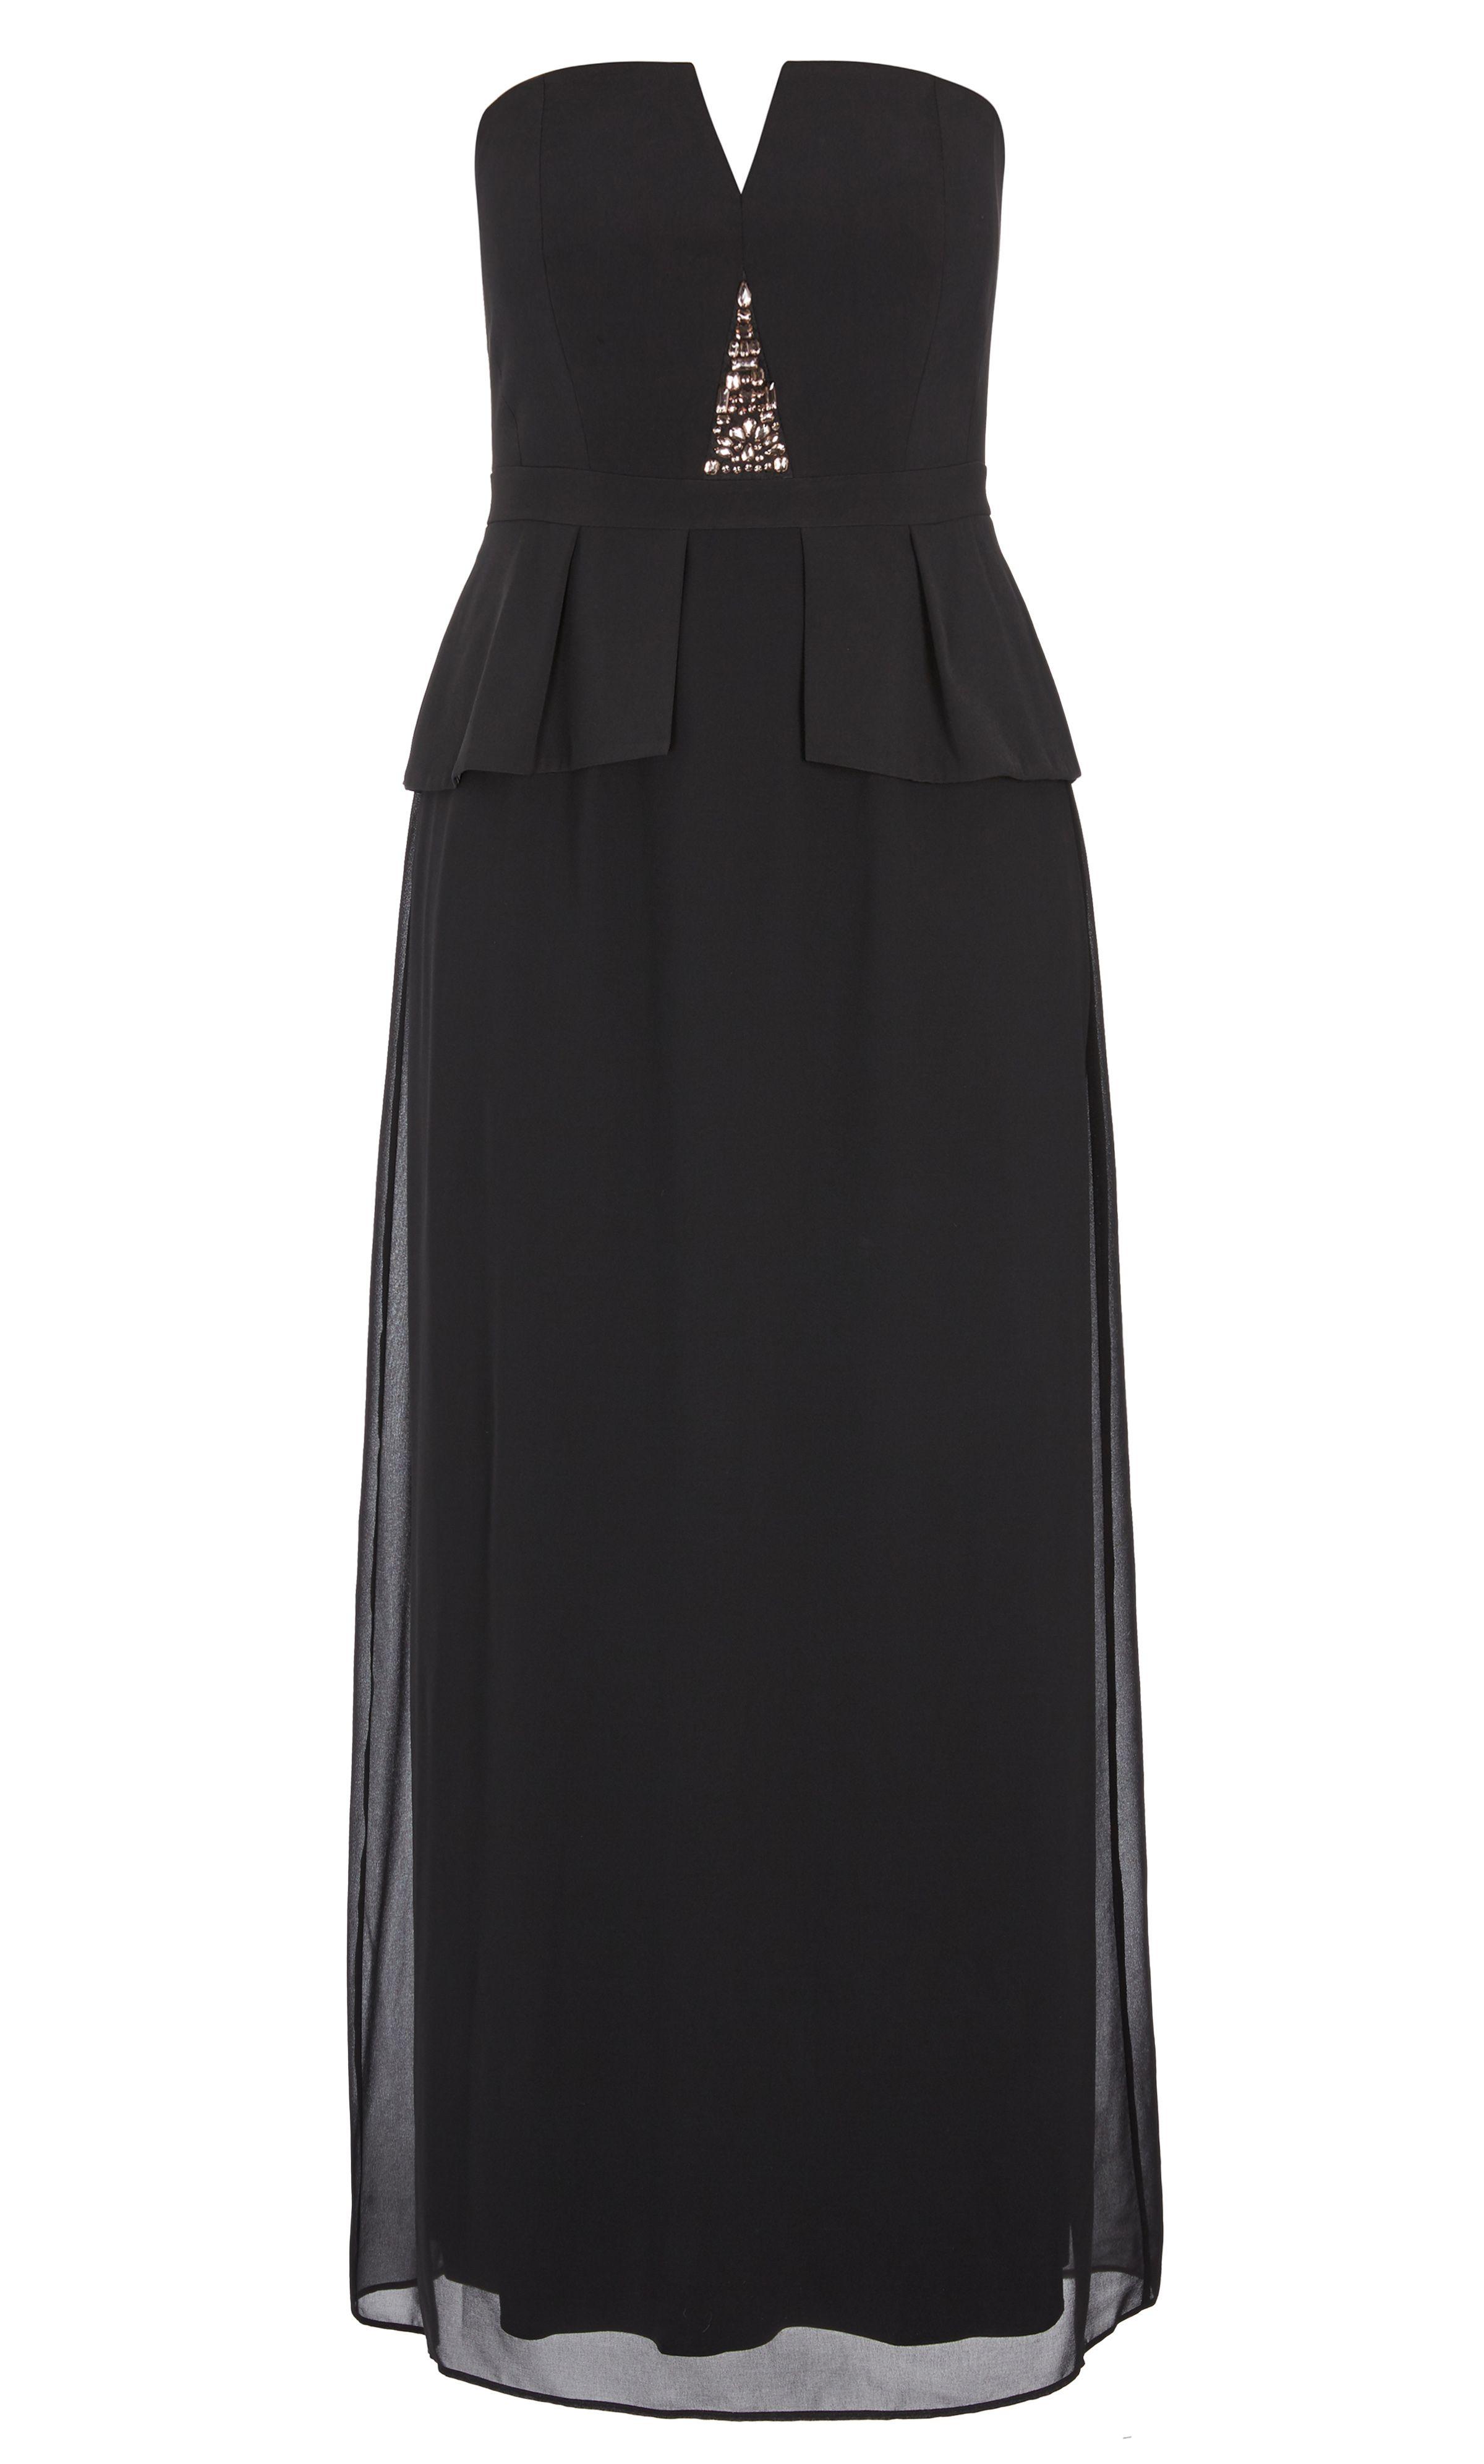 fe1913aa1d3 City Chic - BEADED VIXEN MAXI DRESS - Women s Plus Size Fashion ...